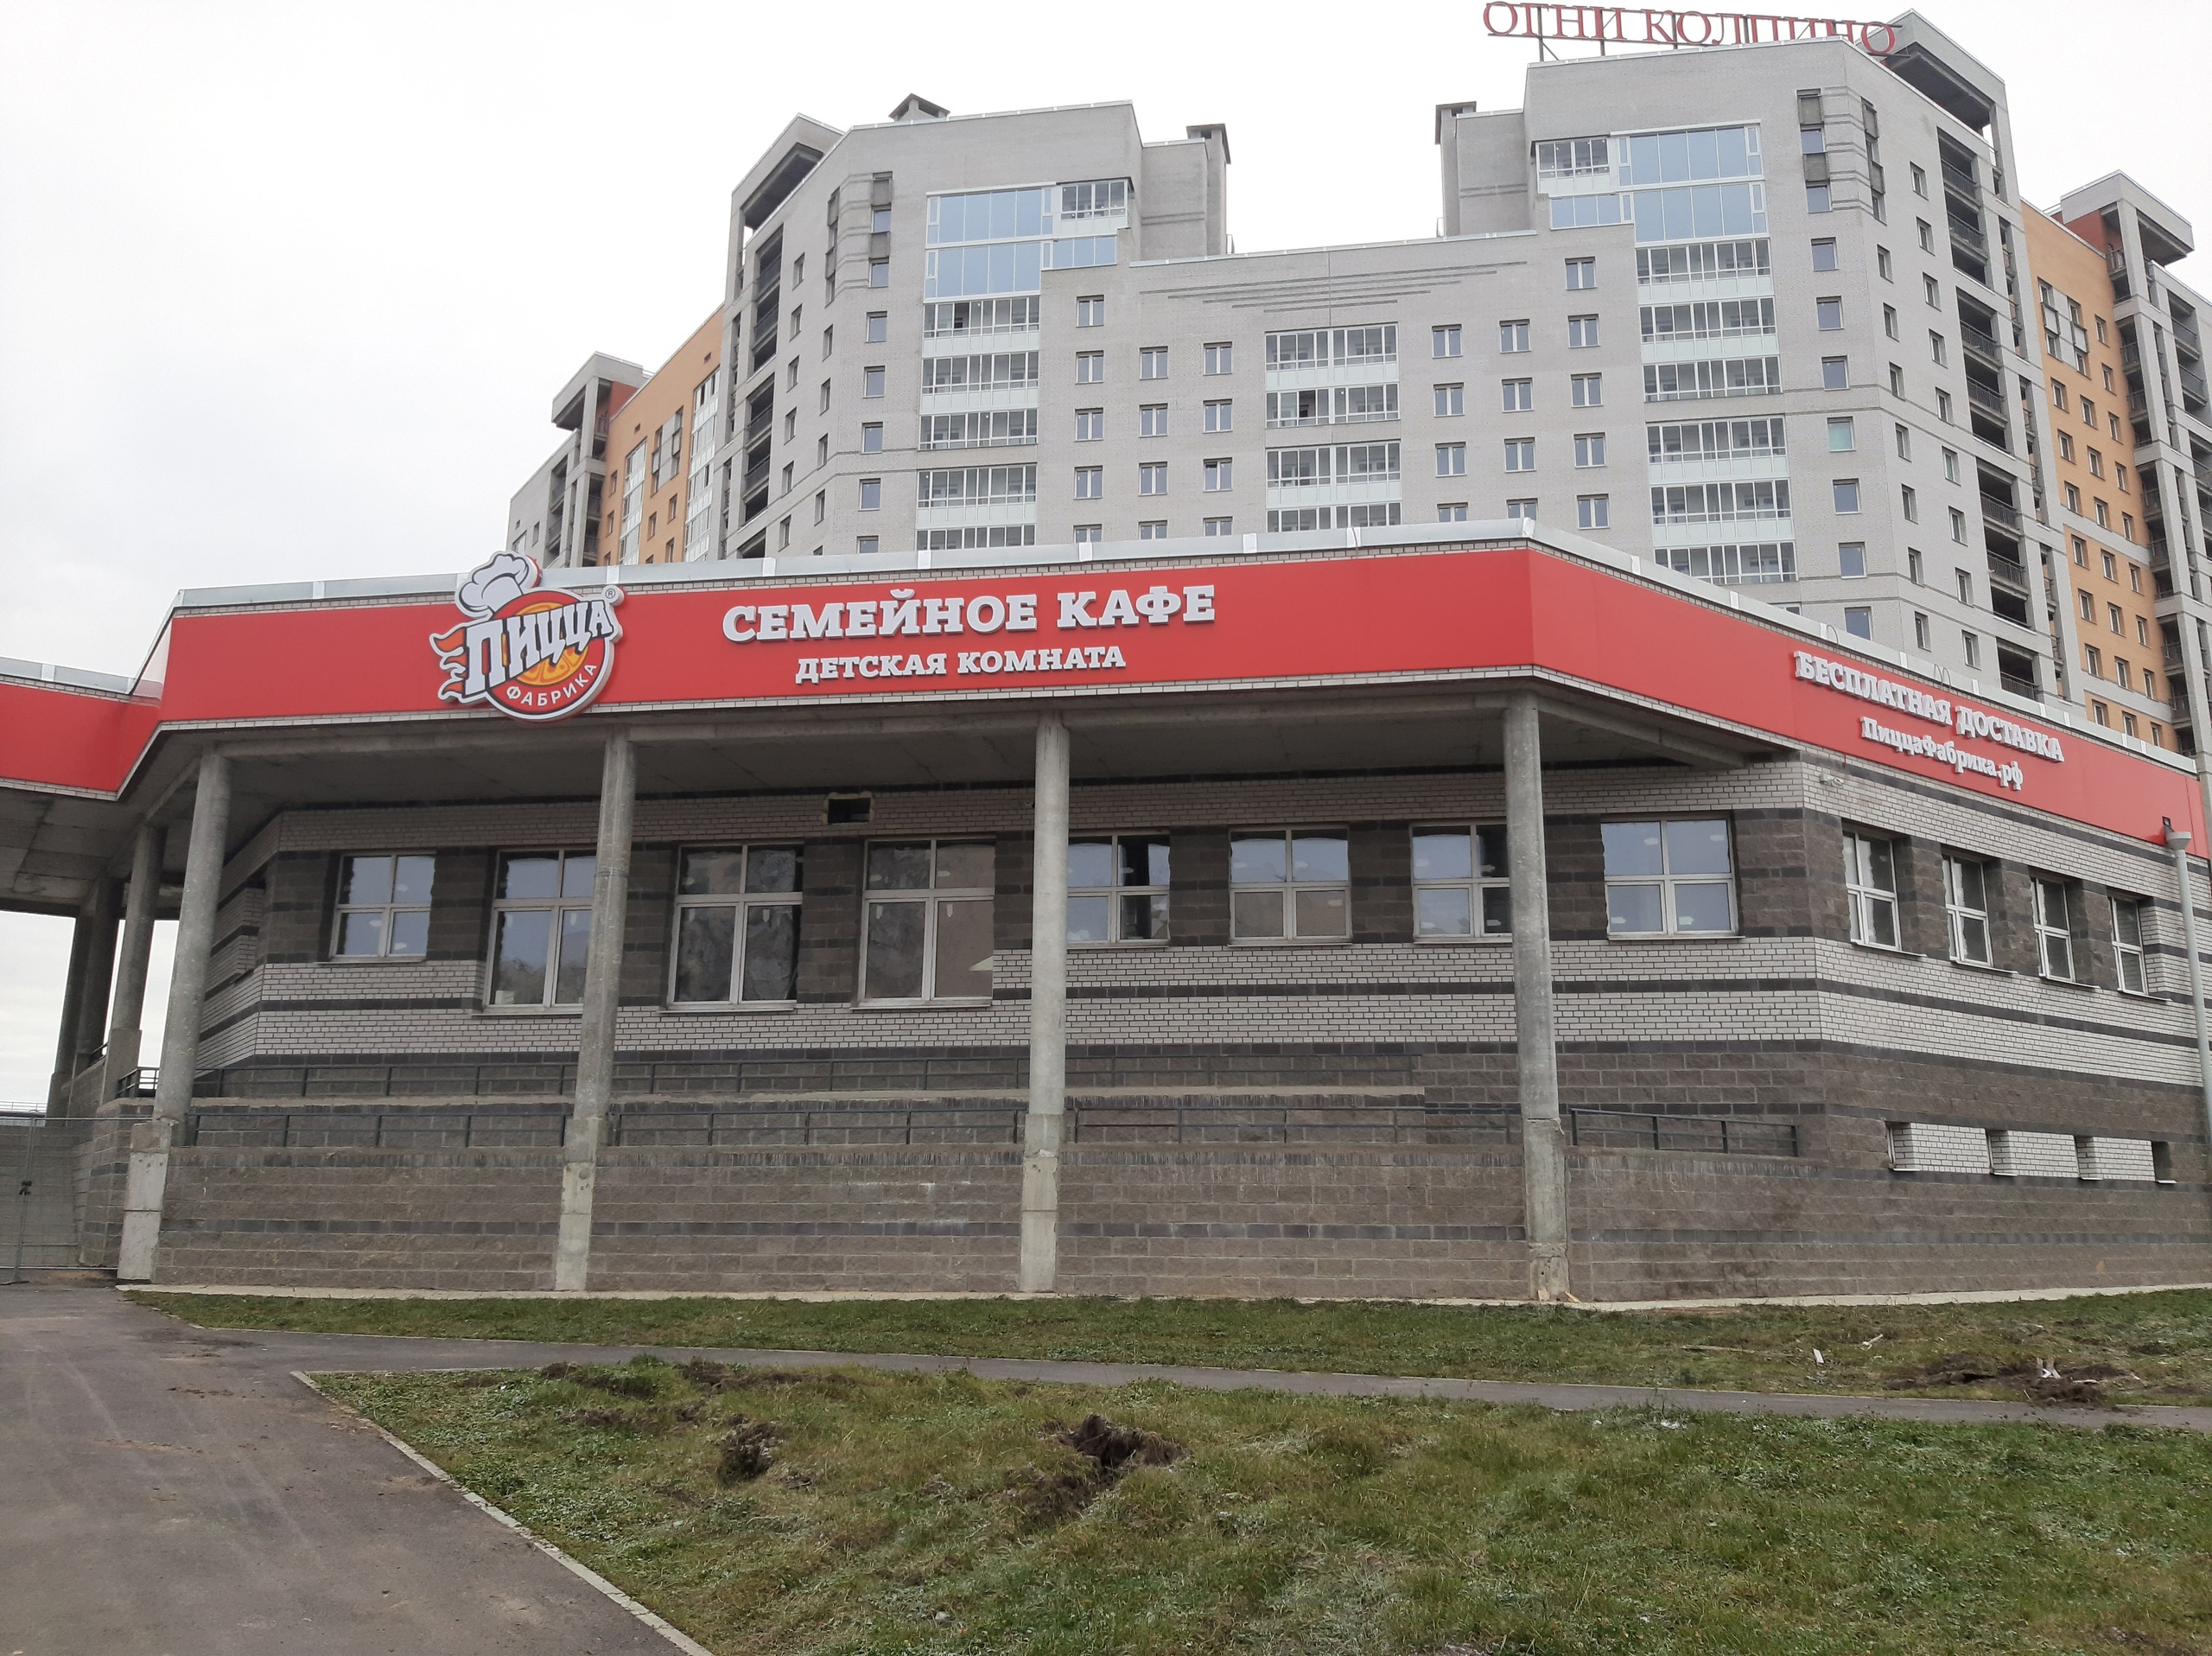 Наружная реклама Череповец